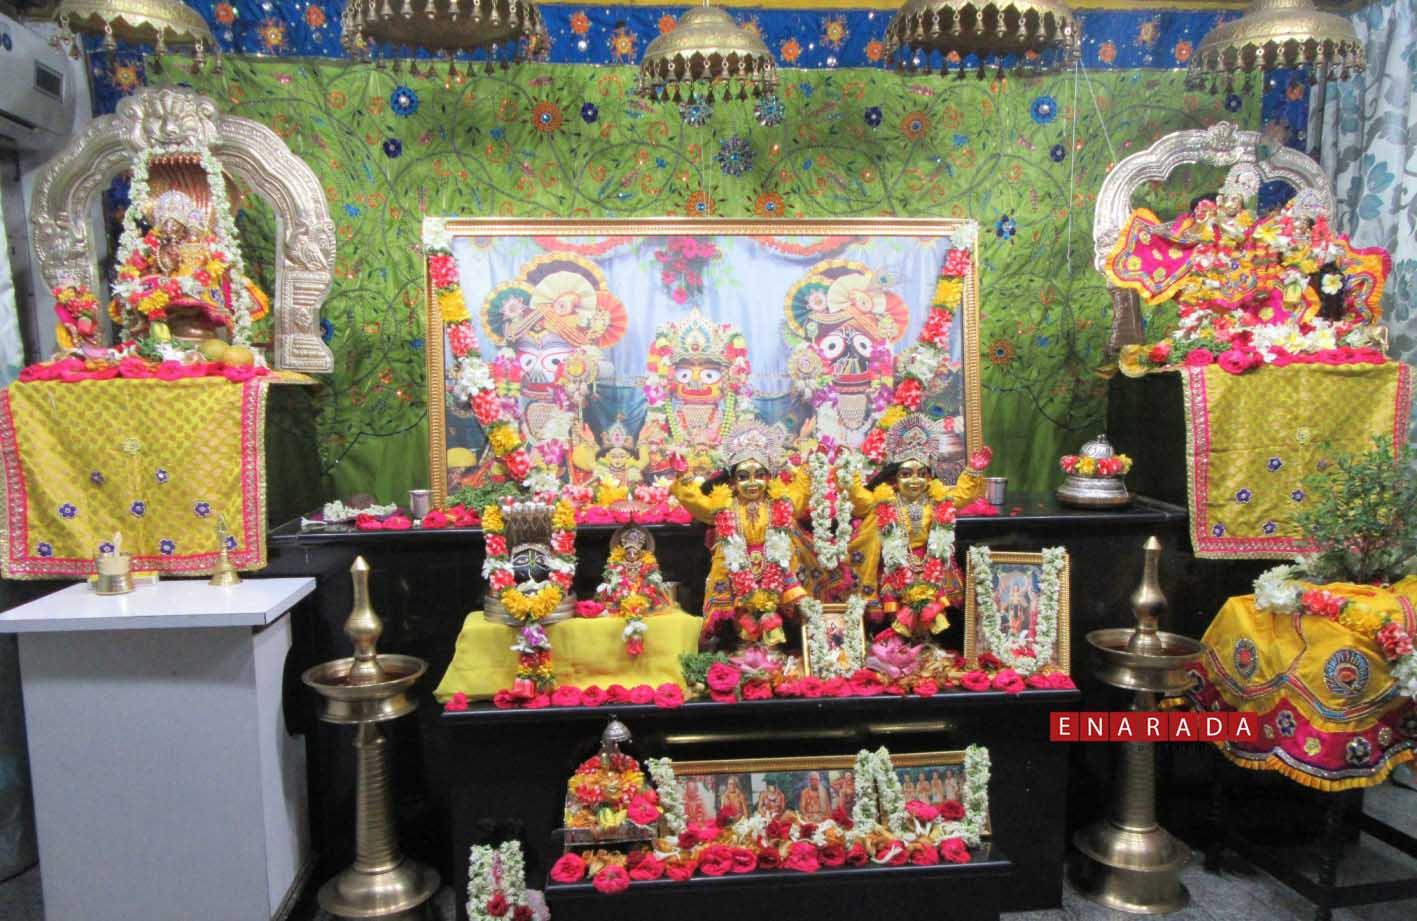 ISKCON Jagannath temple, Bengaluru. Photo: www.enarada.com